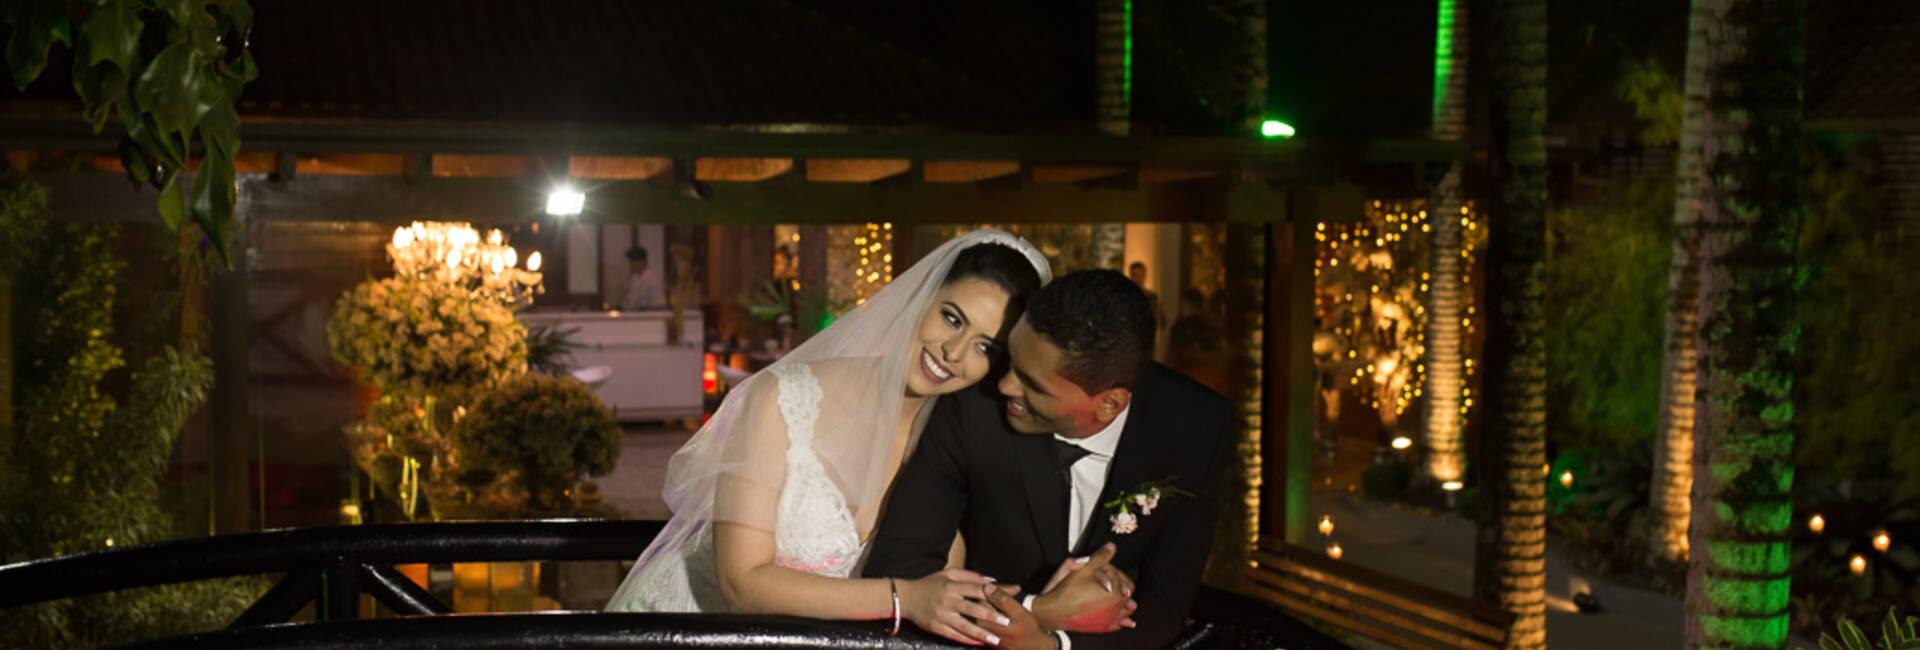 Casamento   de Luciana e Bruno